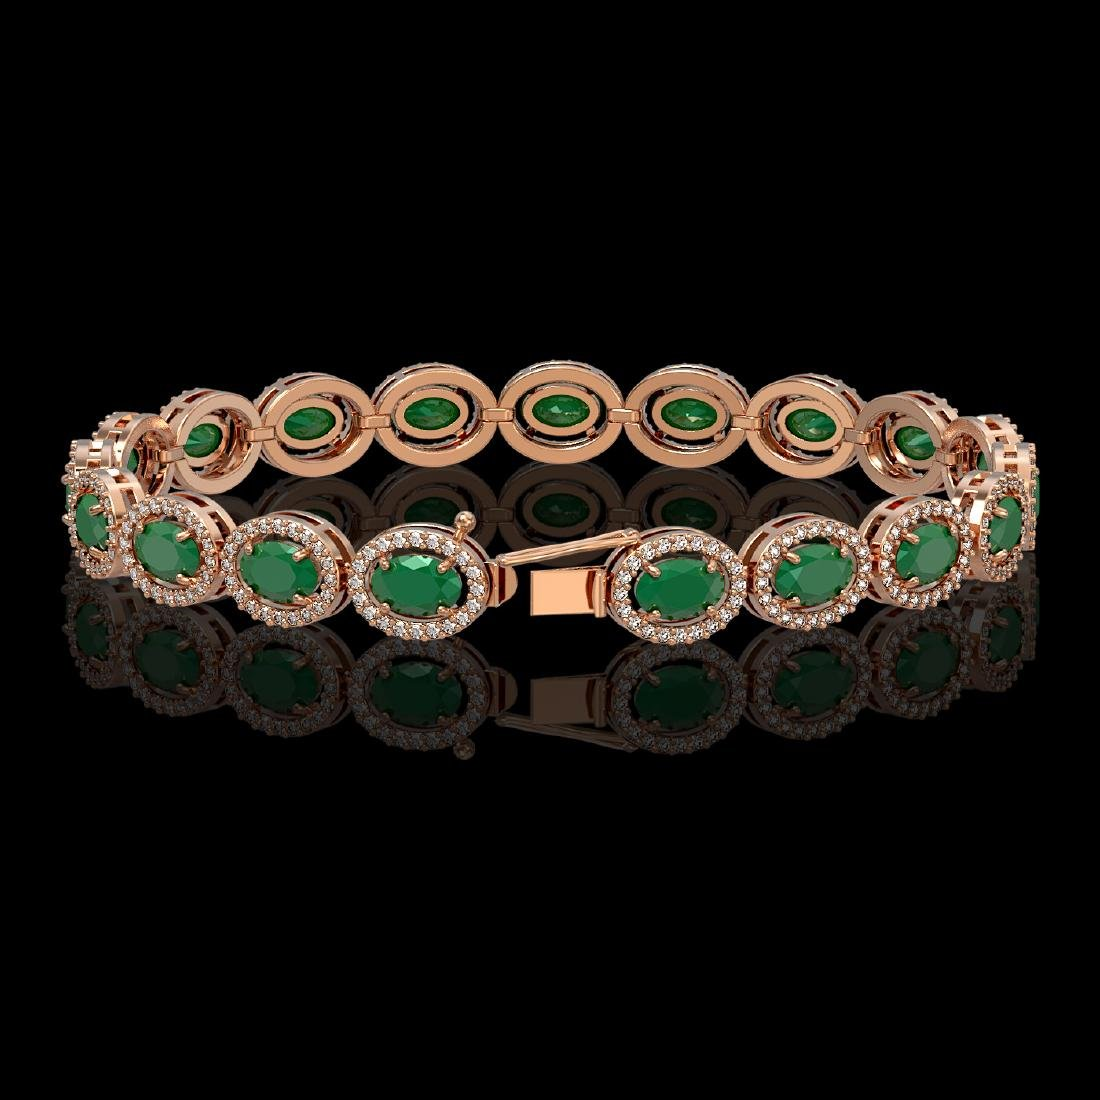 15.2 CTW Emerald & Diamond Halo Bracelet 10K Rose Gold - 2